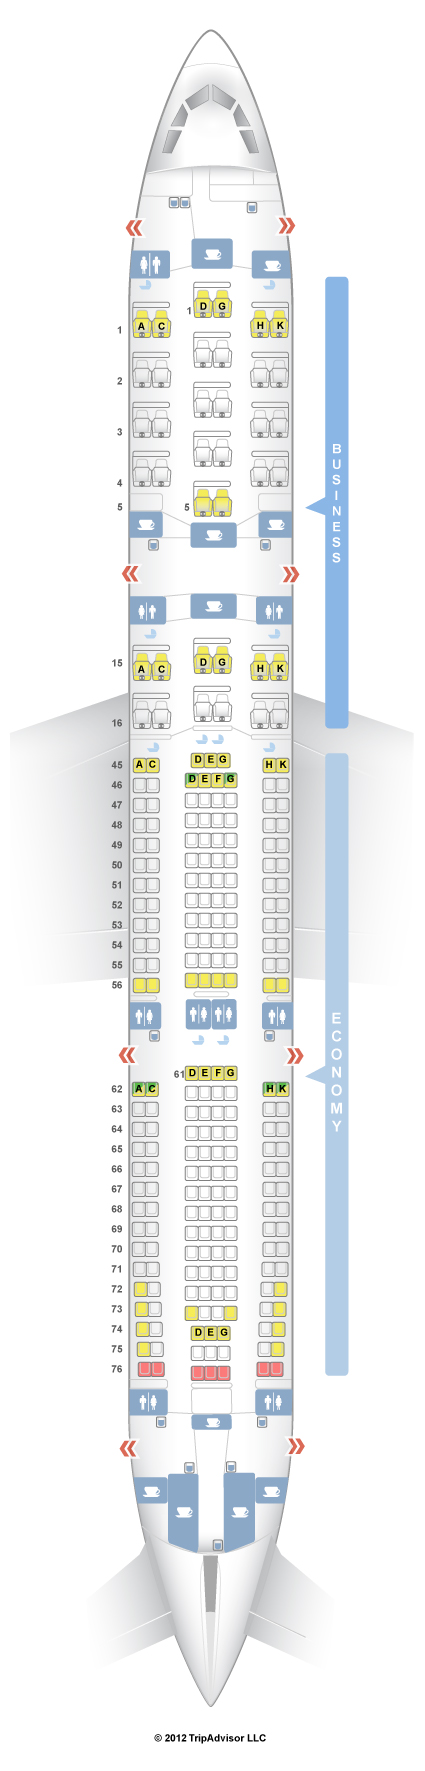 Seatguru Seat Map South African Airways Airbus A340 300 343